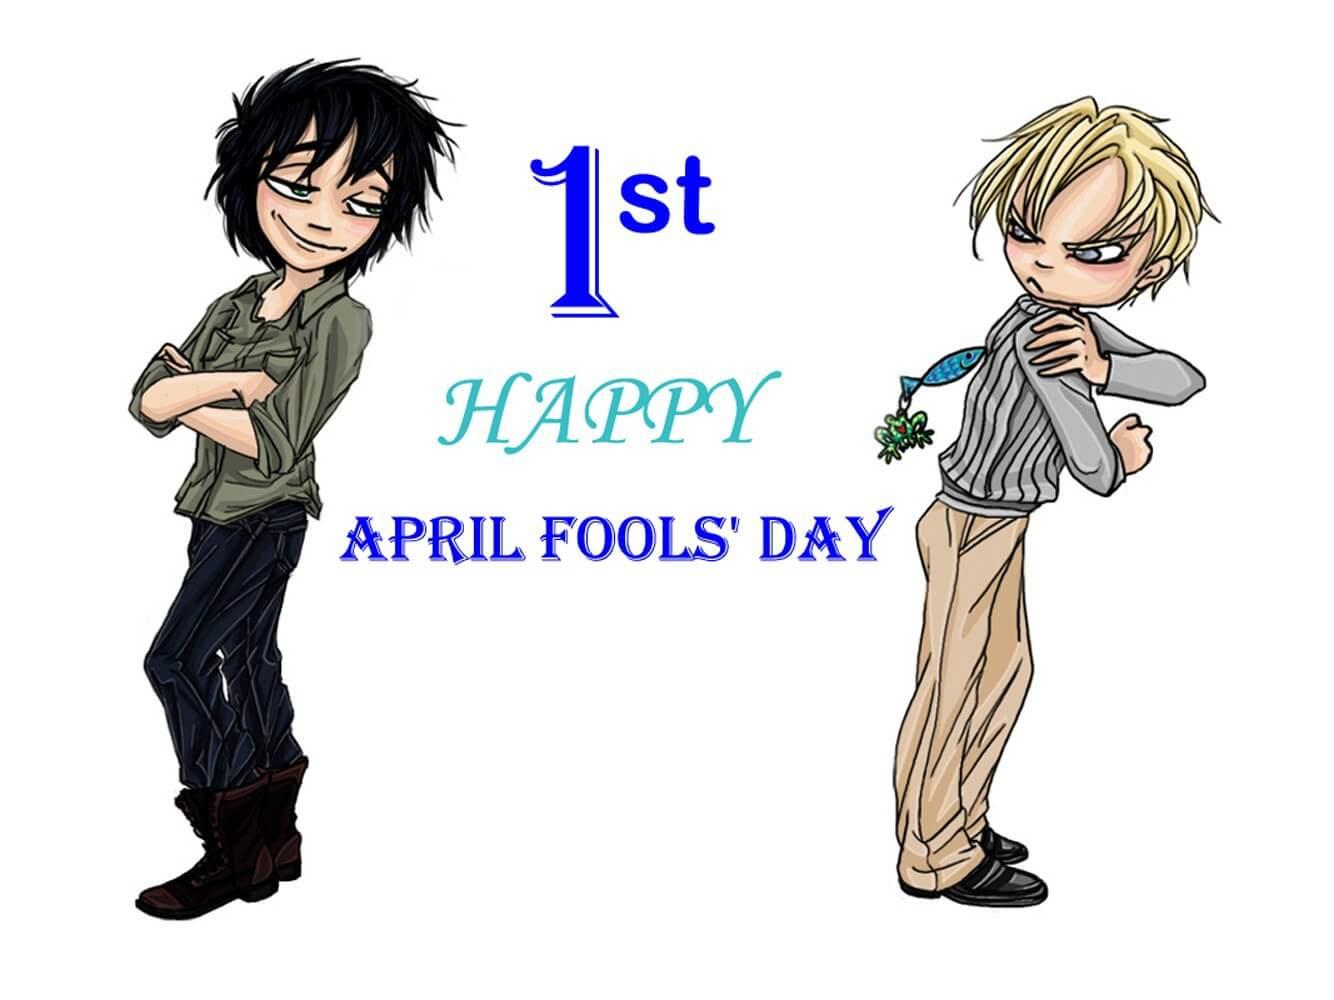 april fools day wallpaper hd free download